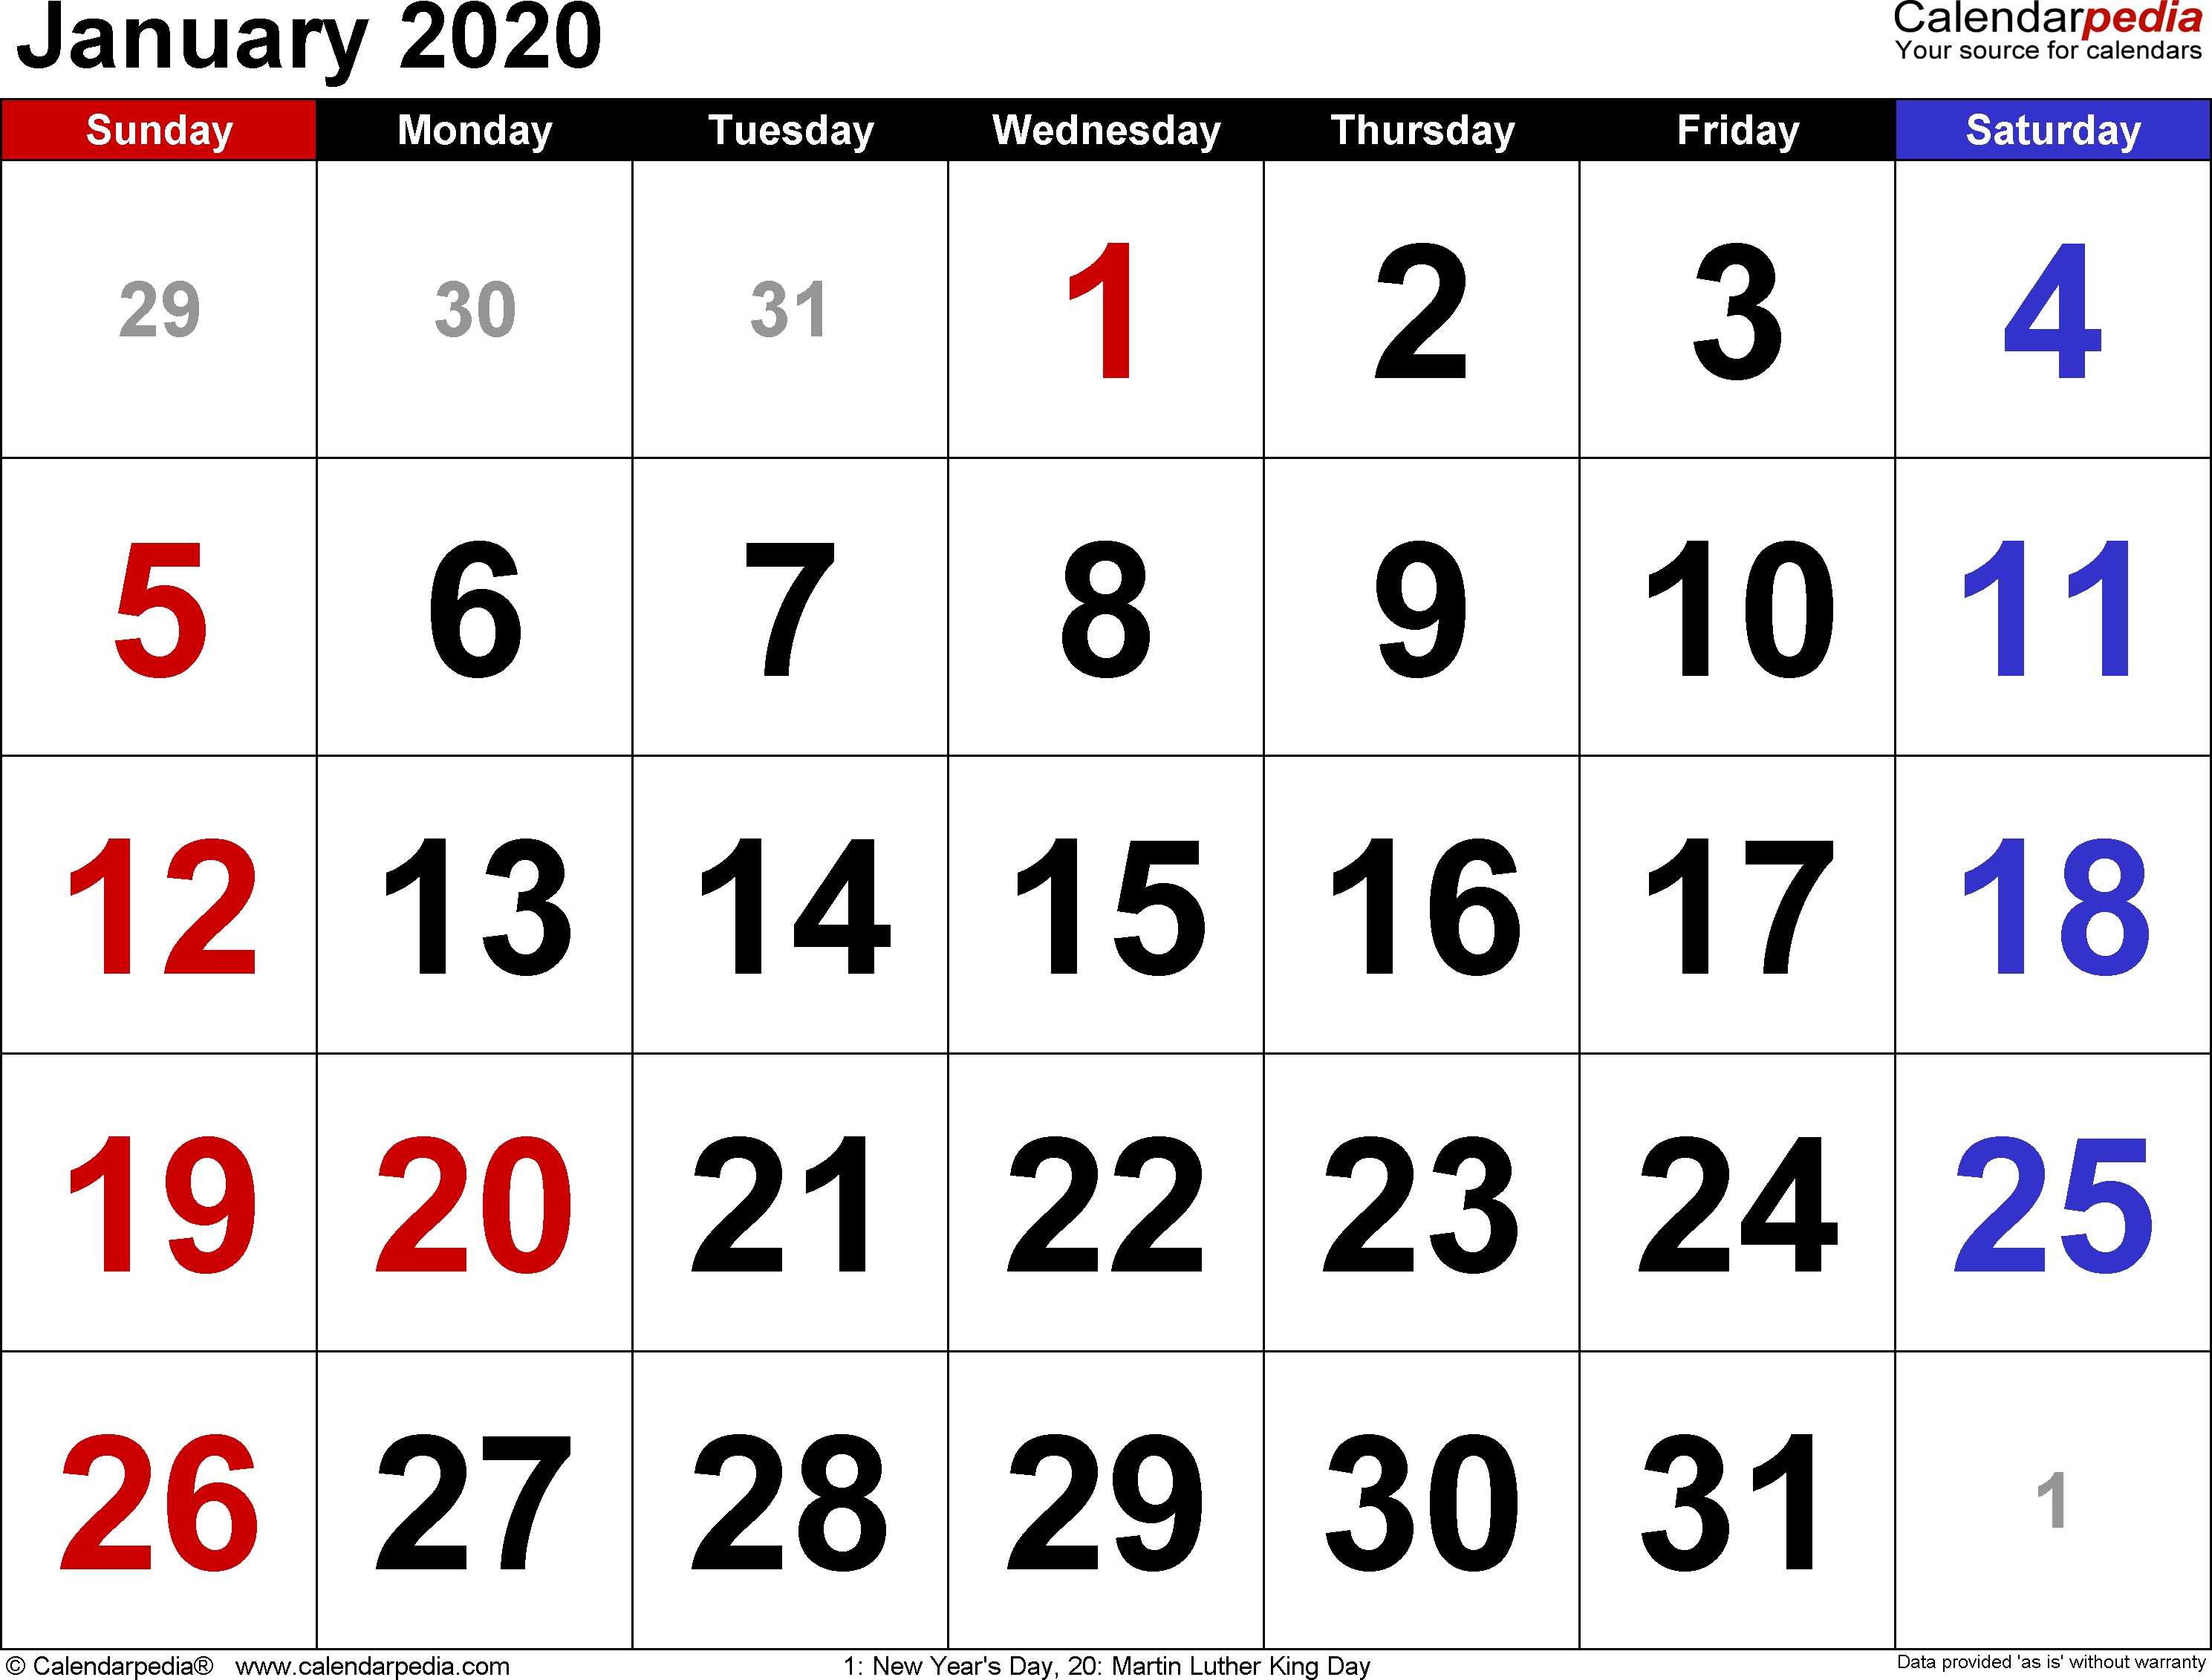 January 2020 Calendars For Word, Excel & Pdf-January 2020 Calendar Events